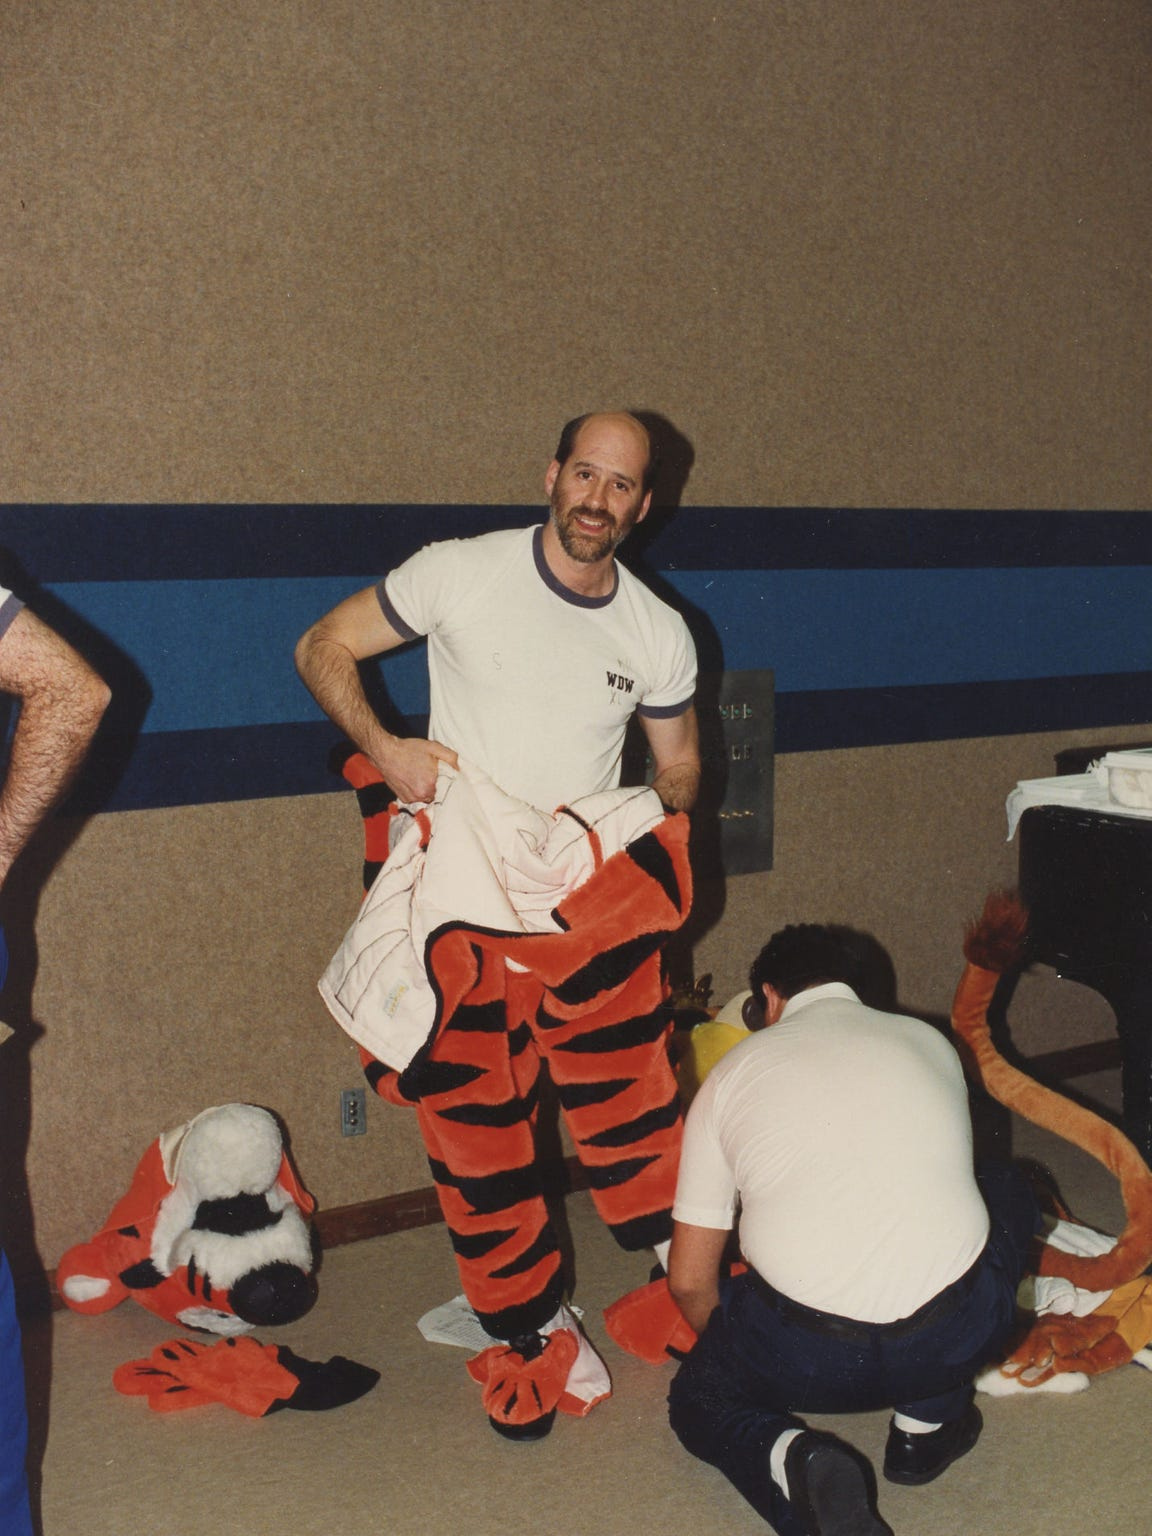 David Vogel dresses up as Tigger at Disneyland. It's